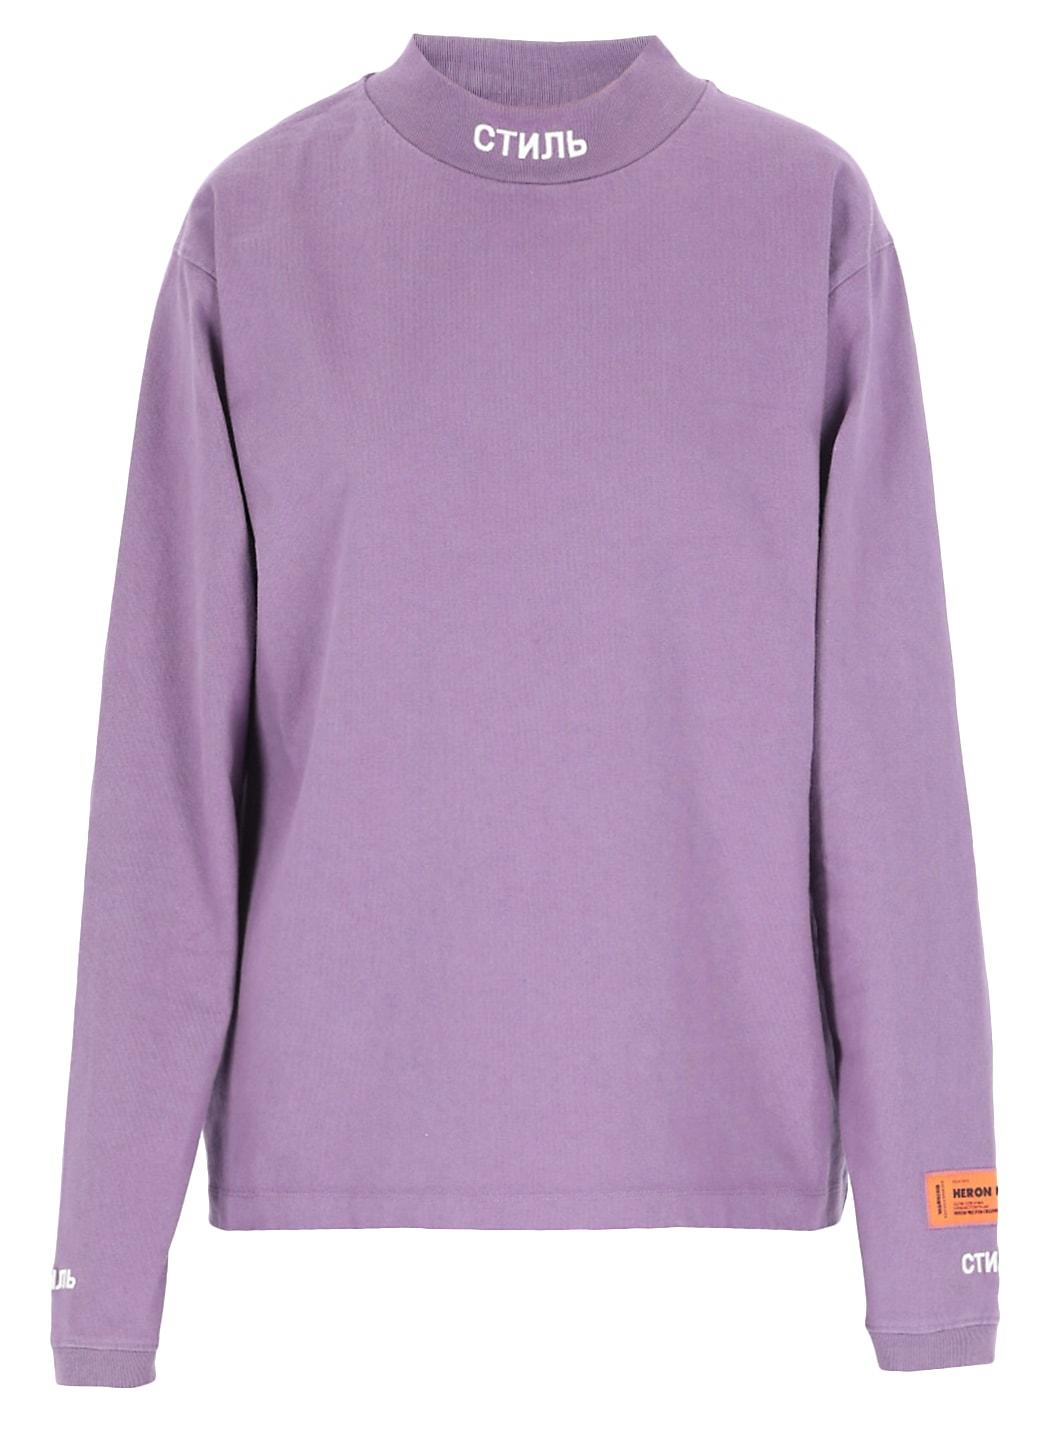 HERON PRESTON Cotton Sweater